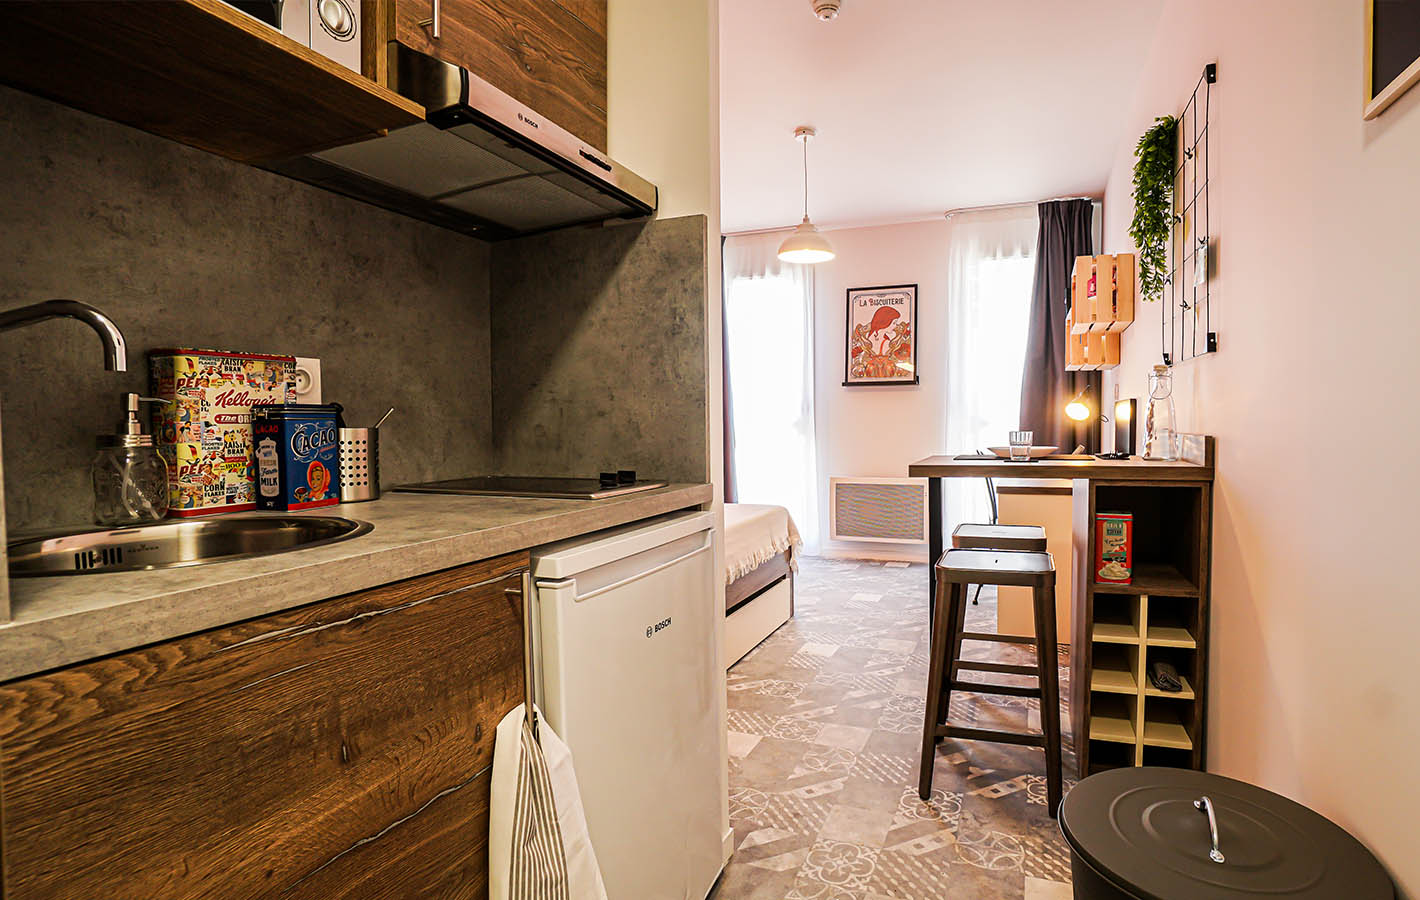 image  2021 04 15 residence etudiante suitetudes biscuiterie caen studio cuisine